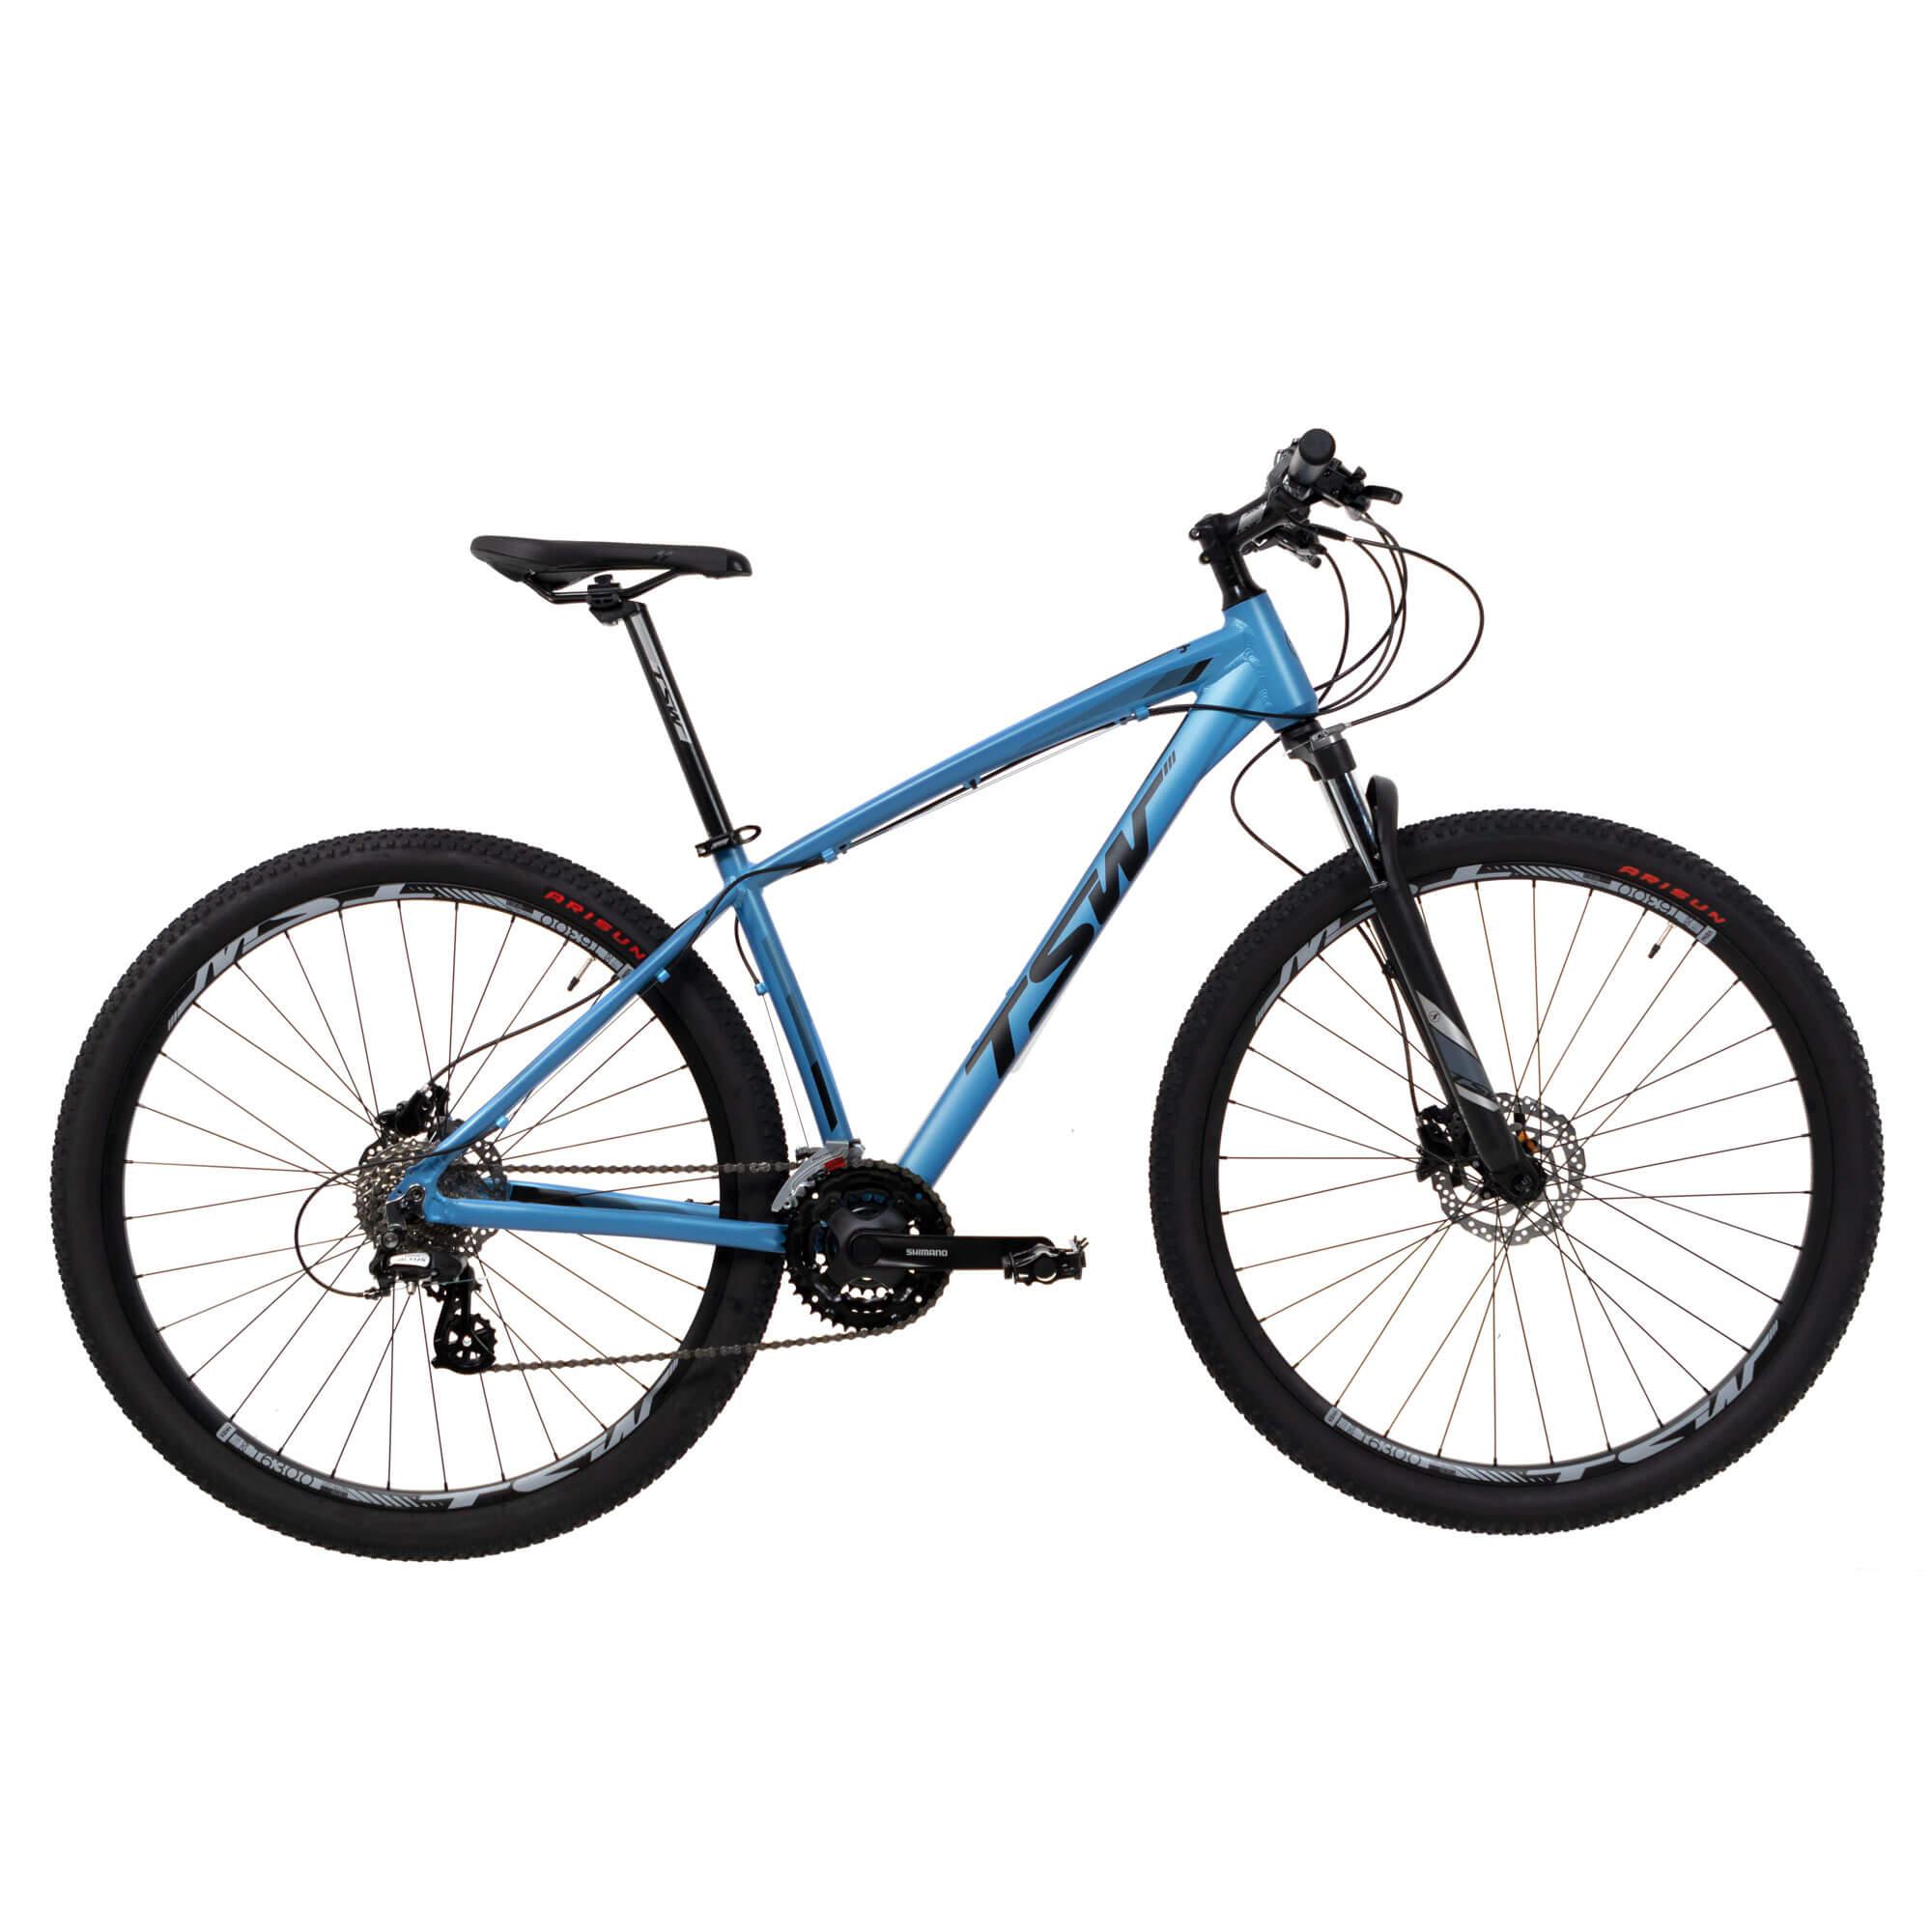 Bicicleta 29 Tsw Hunch 24 Velocidades